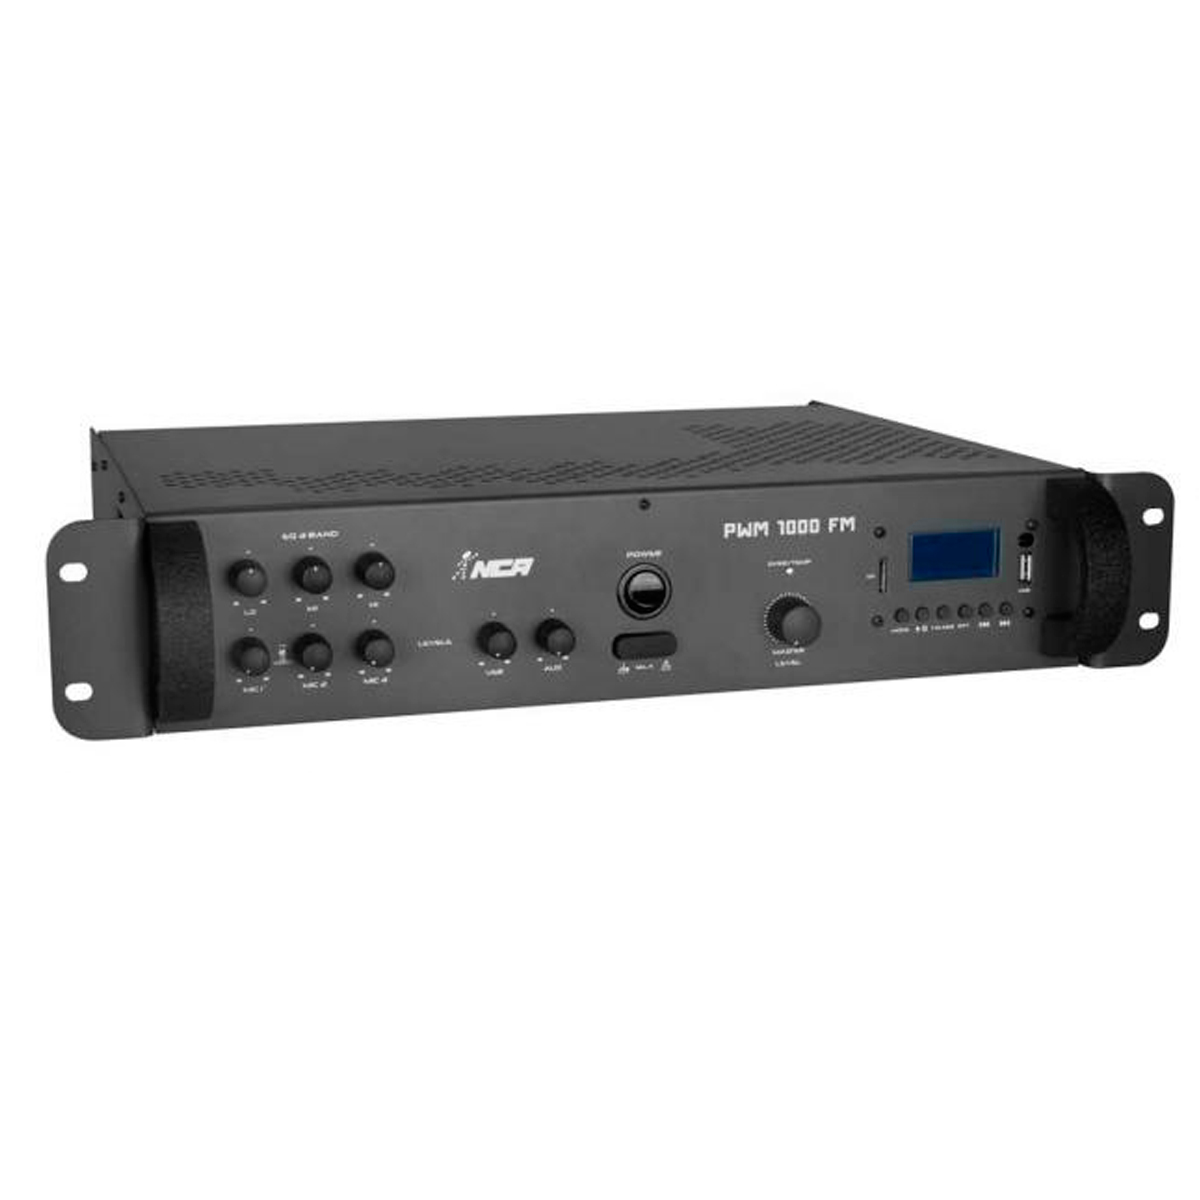 PWM1000FM - Amplificador Som Ambiente 250W c/ USB e FM PWM 1000 FM - NCA